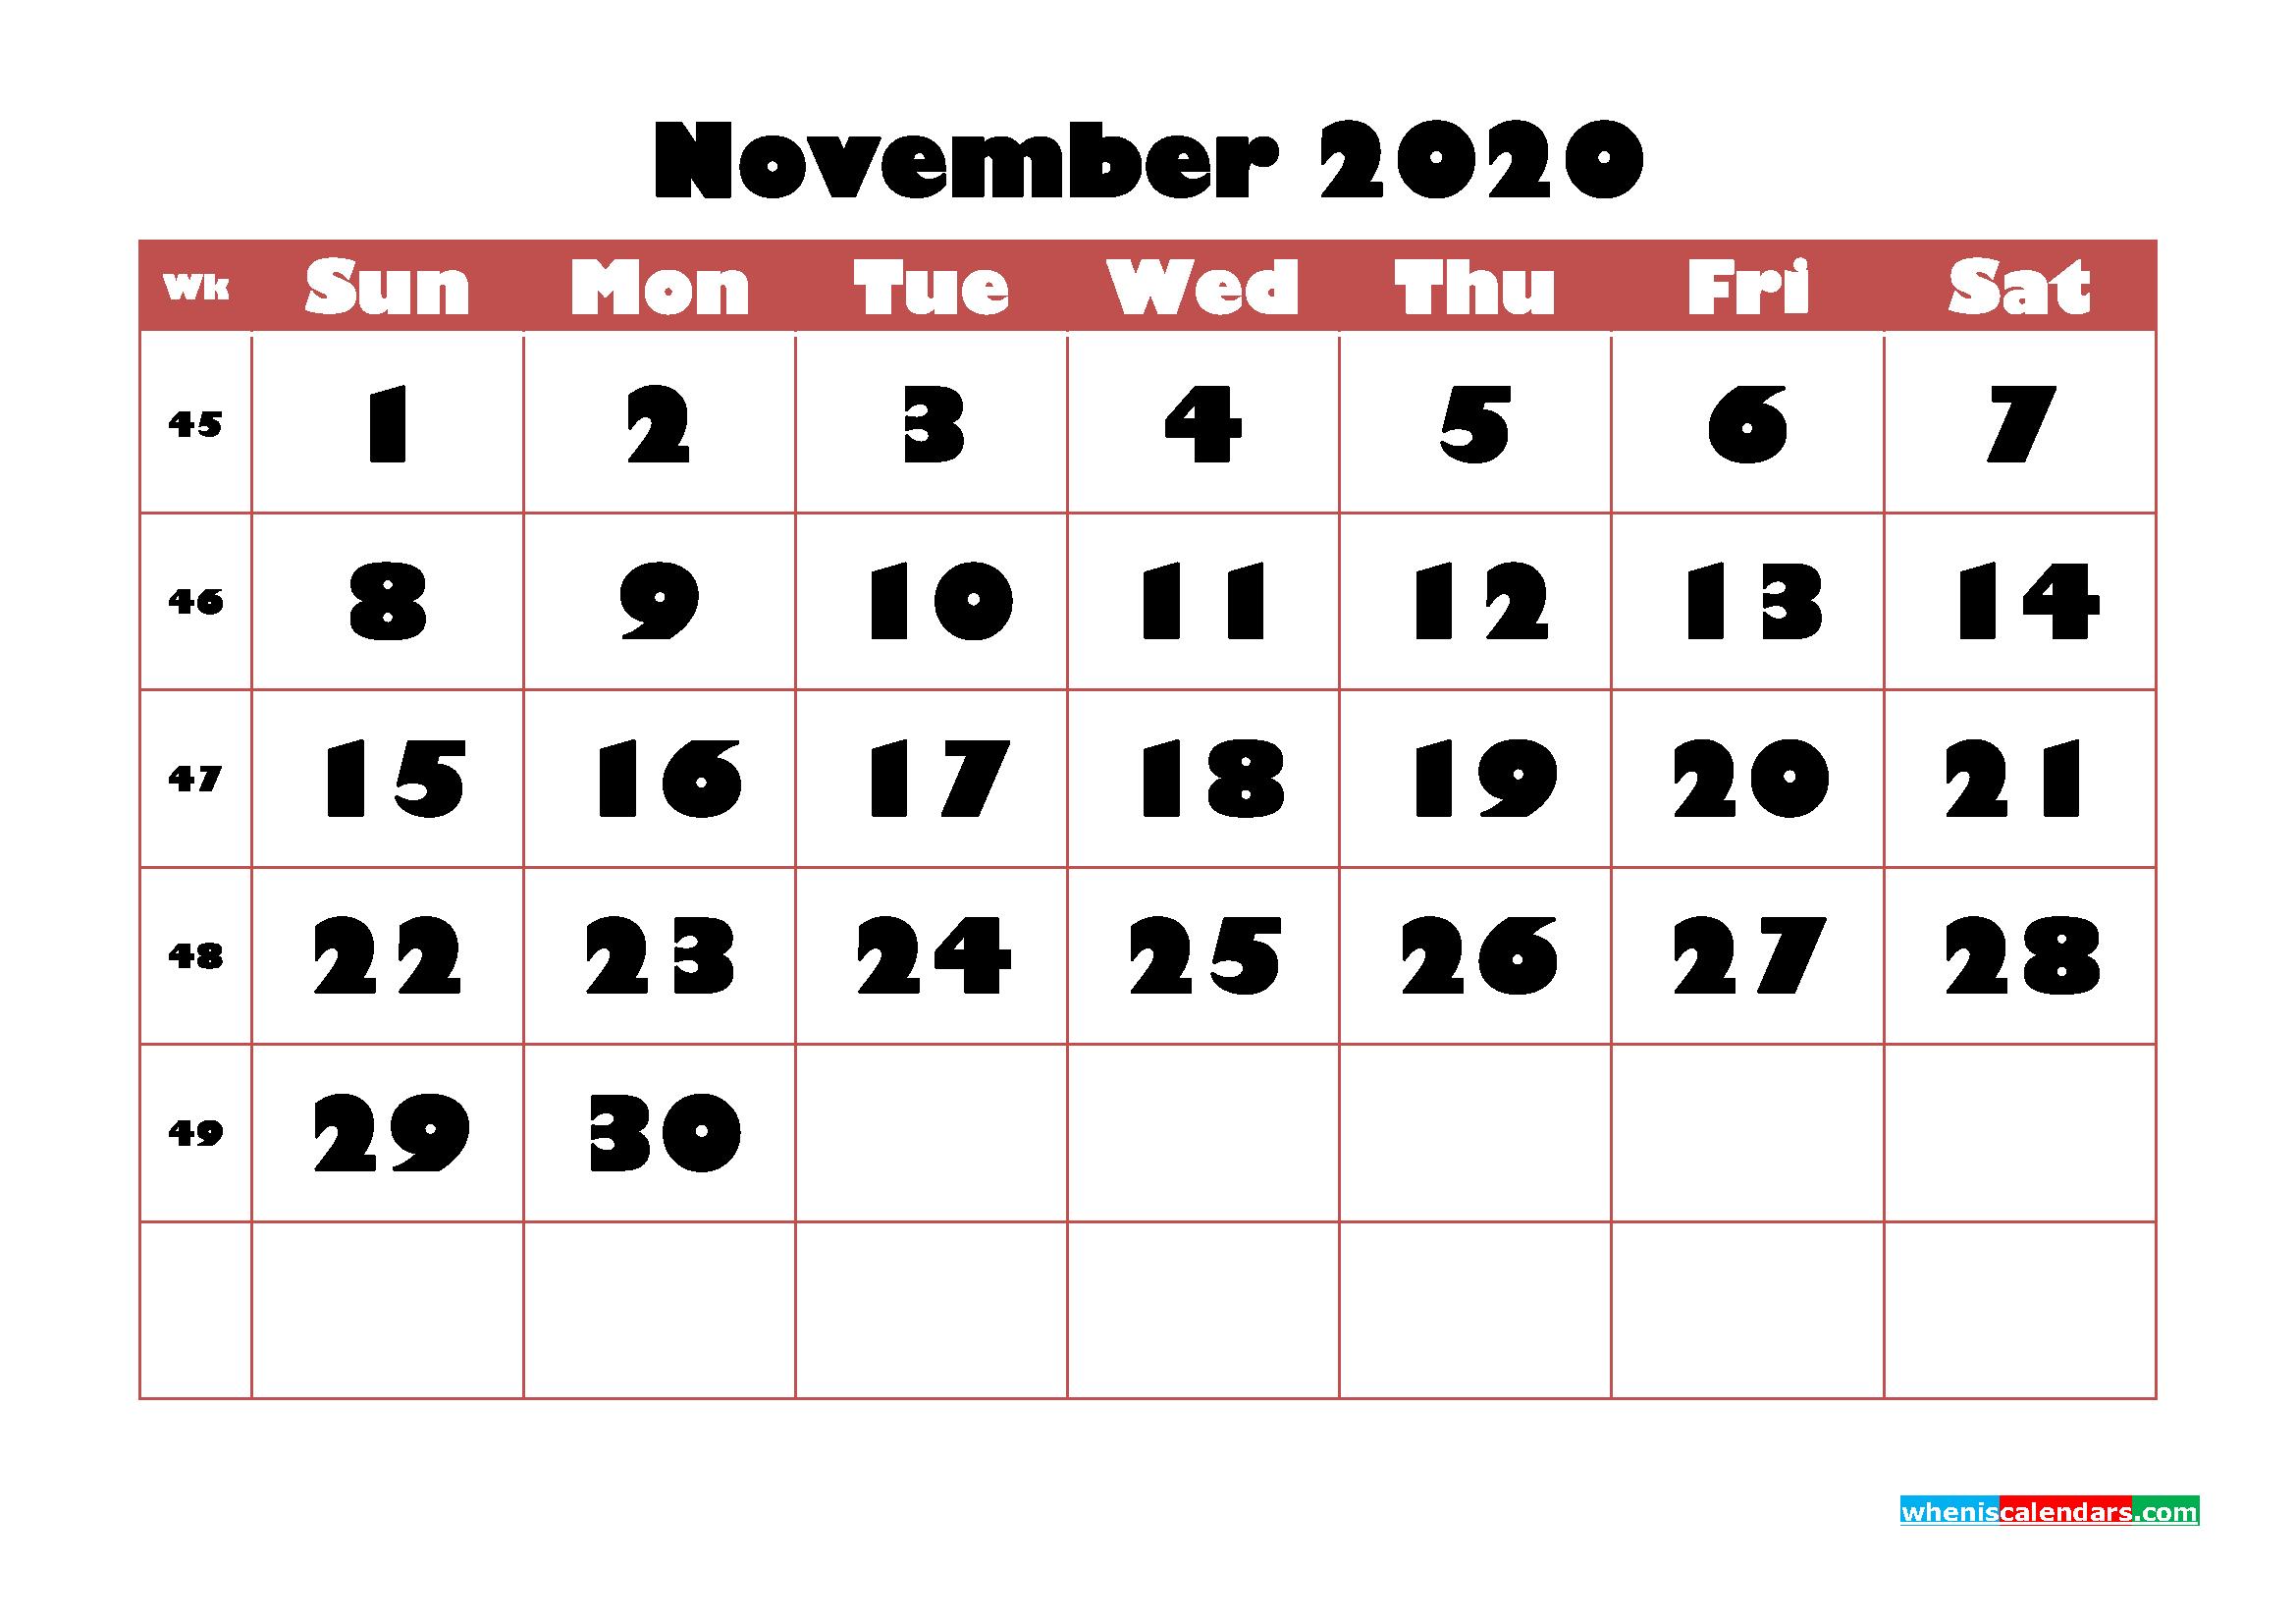 Free Printable Calendar November 2020 PDF, Word - No.m20b731